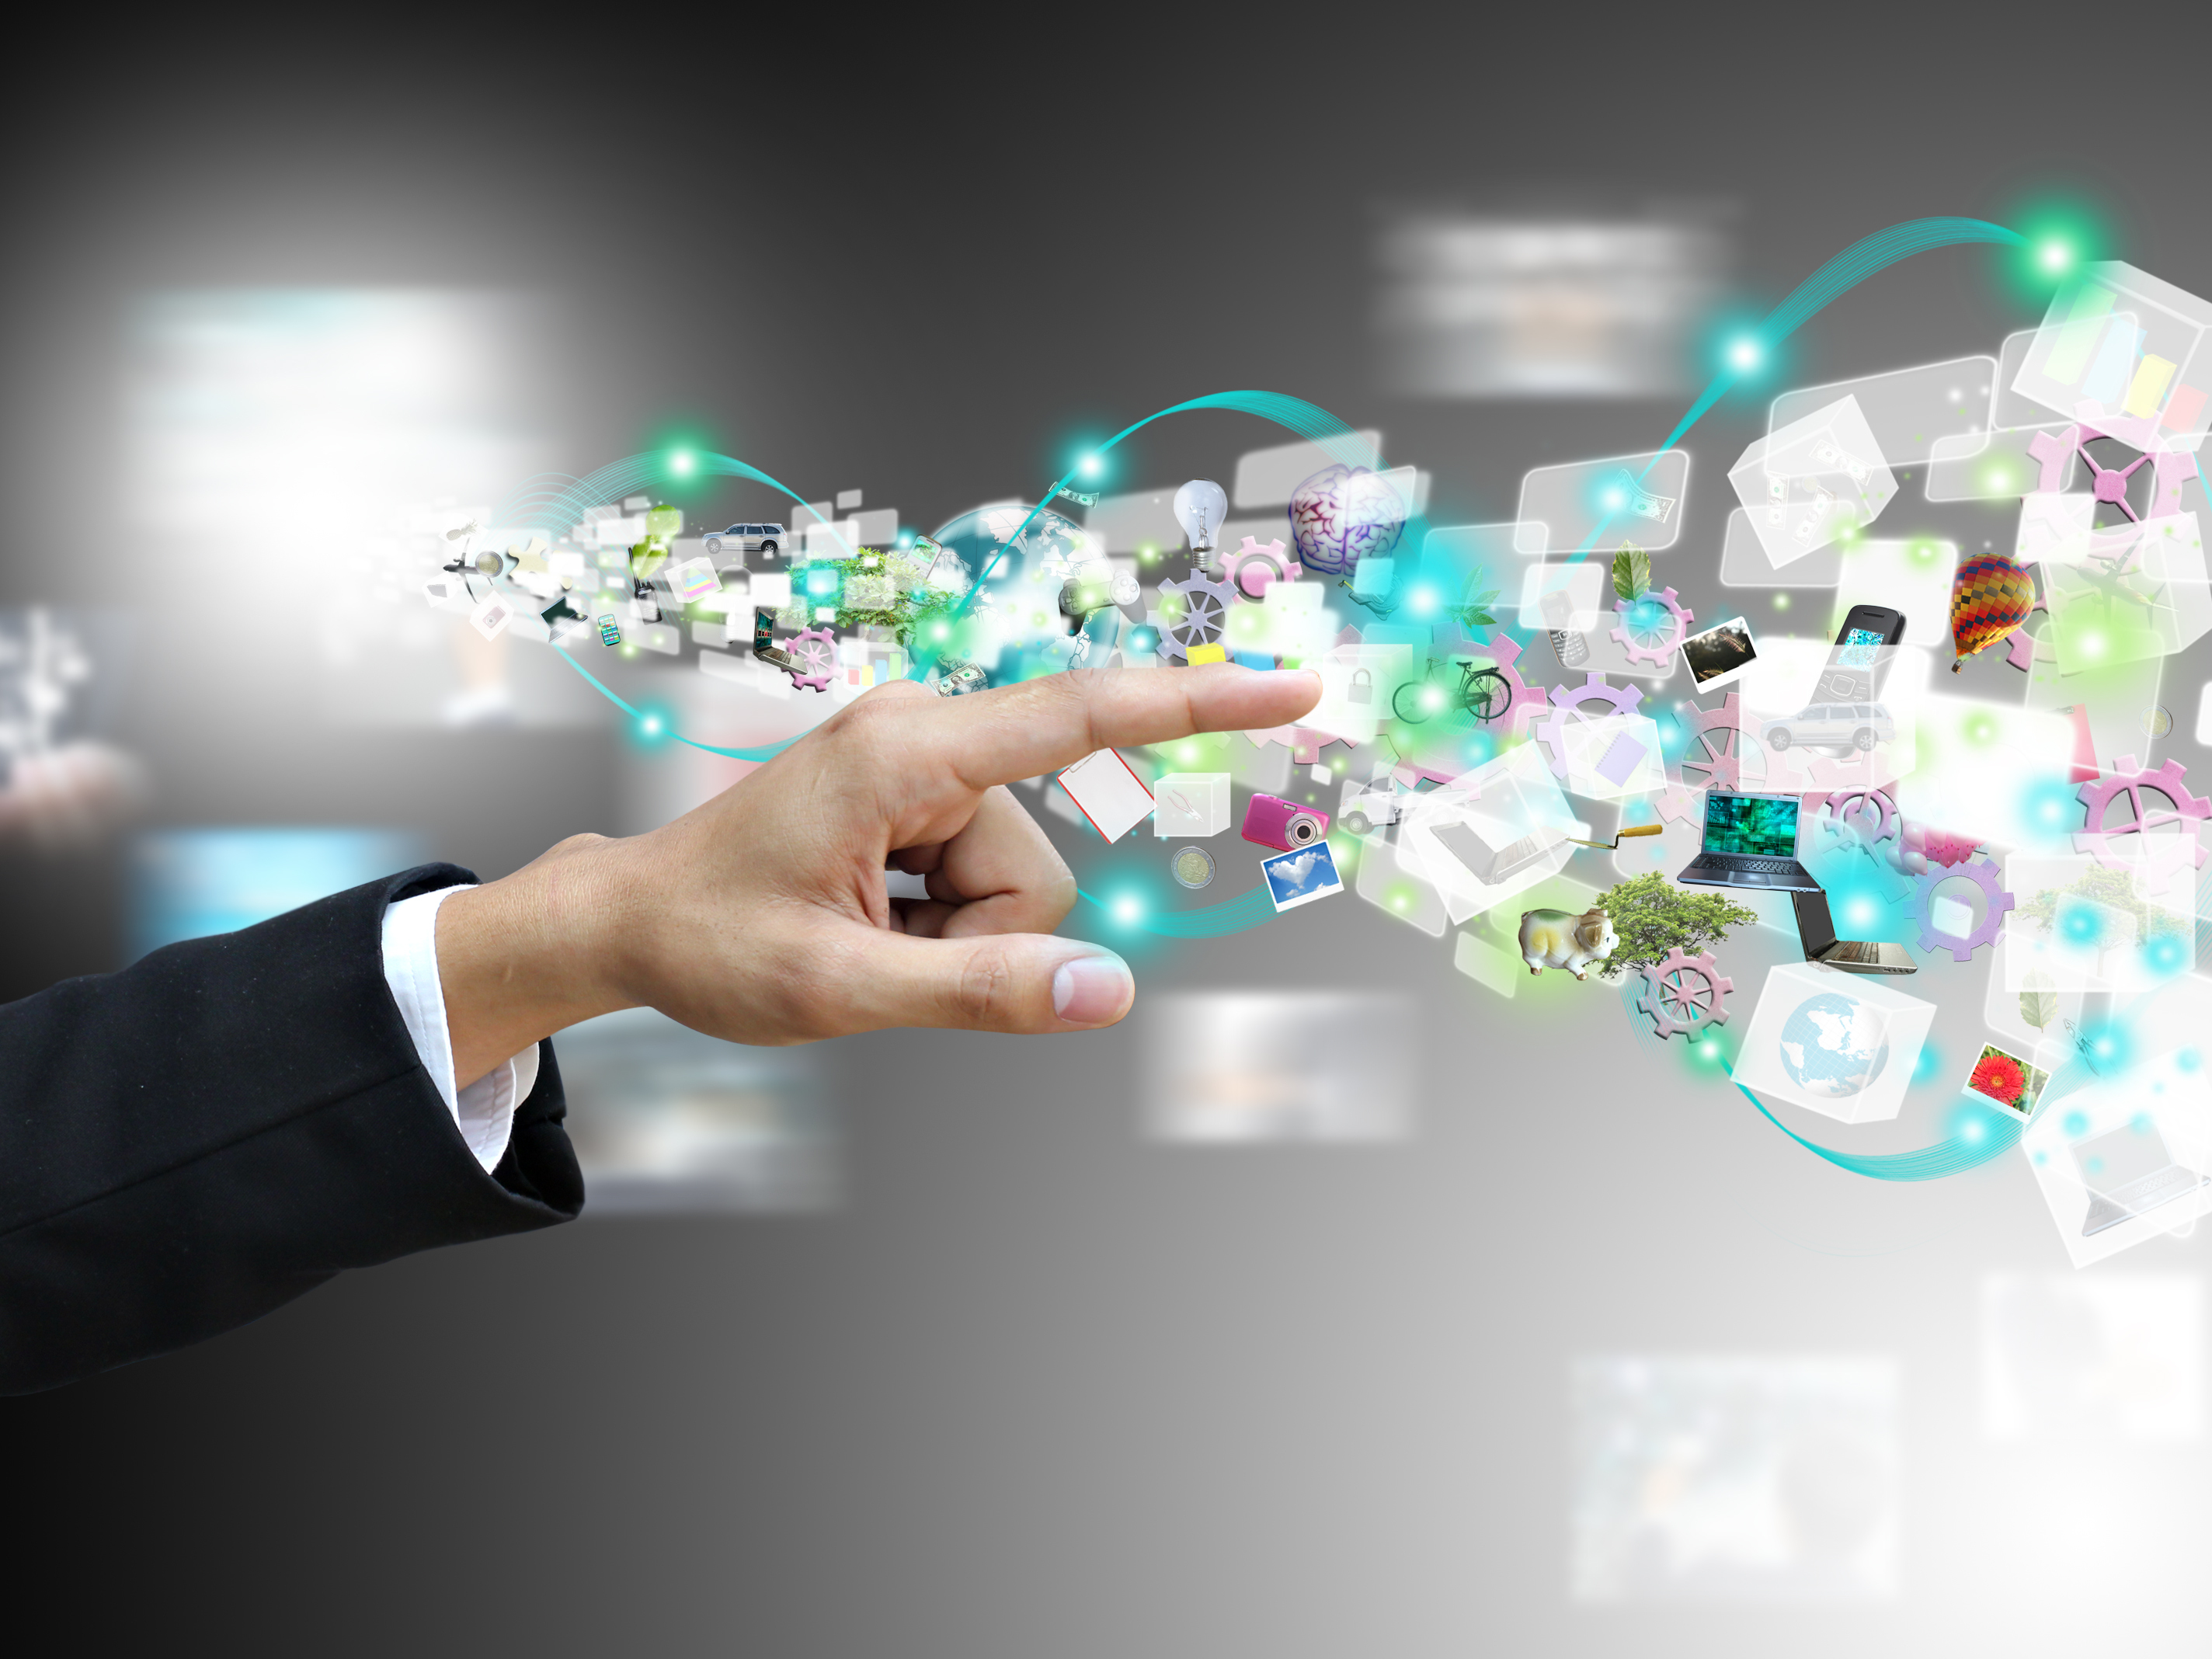 Cisco Digital Network Architecture